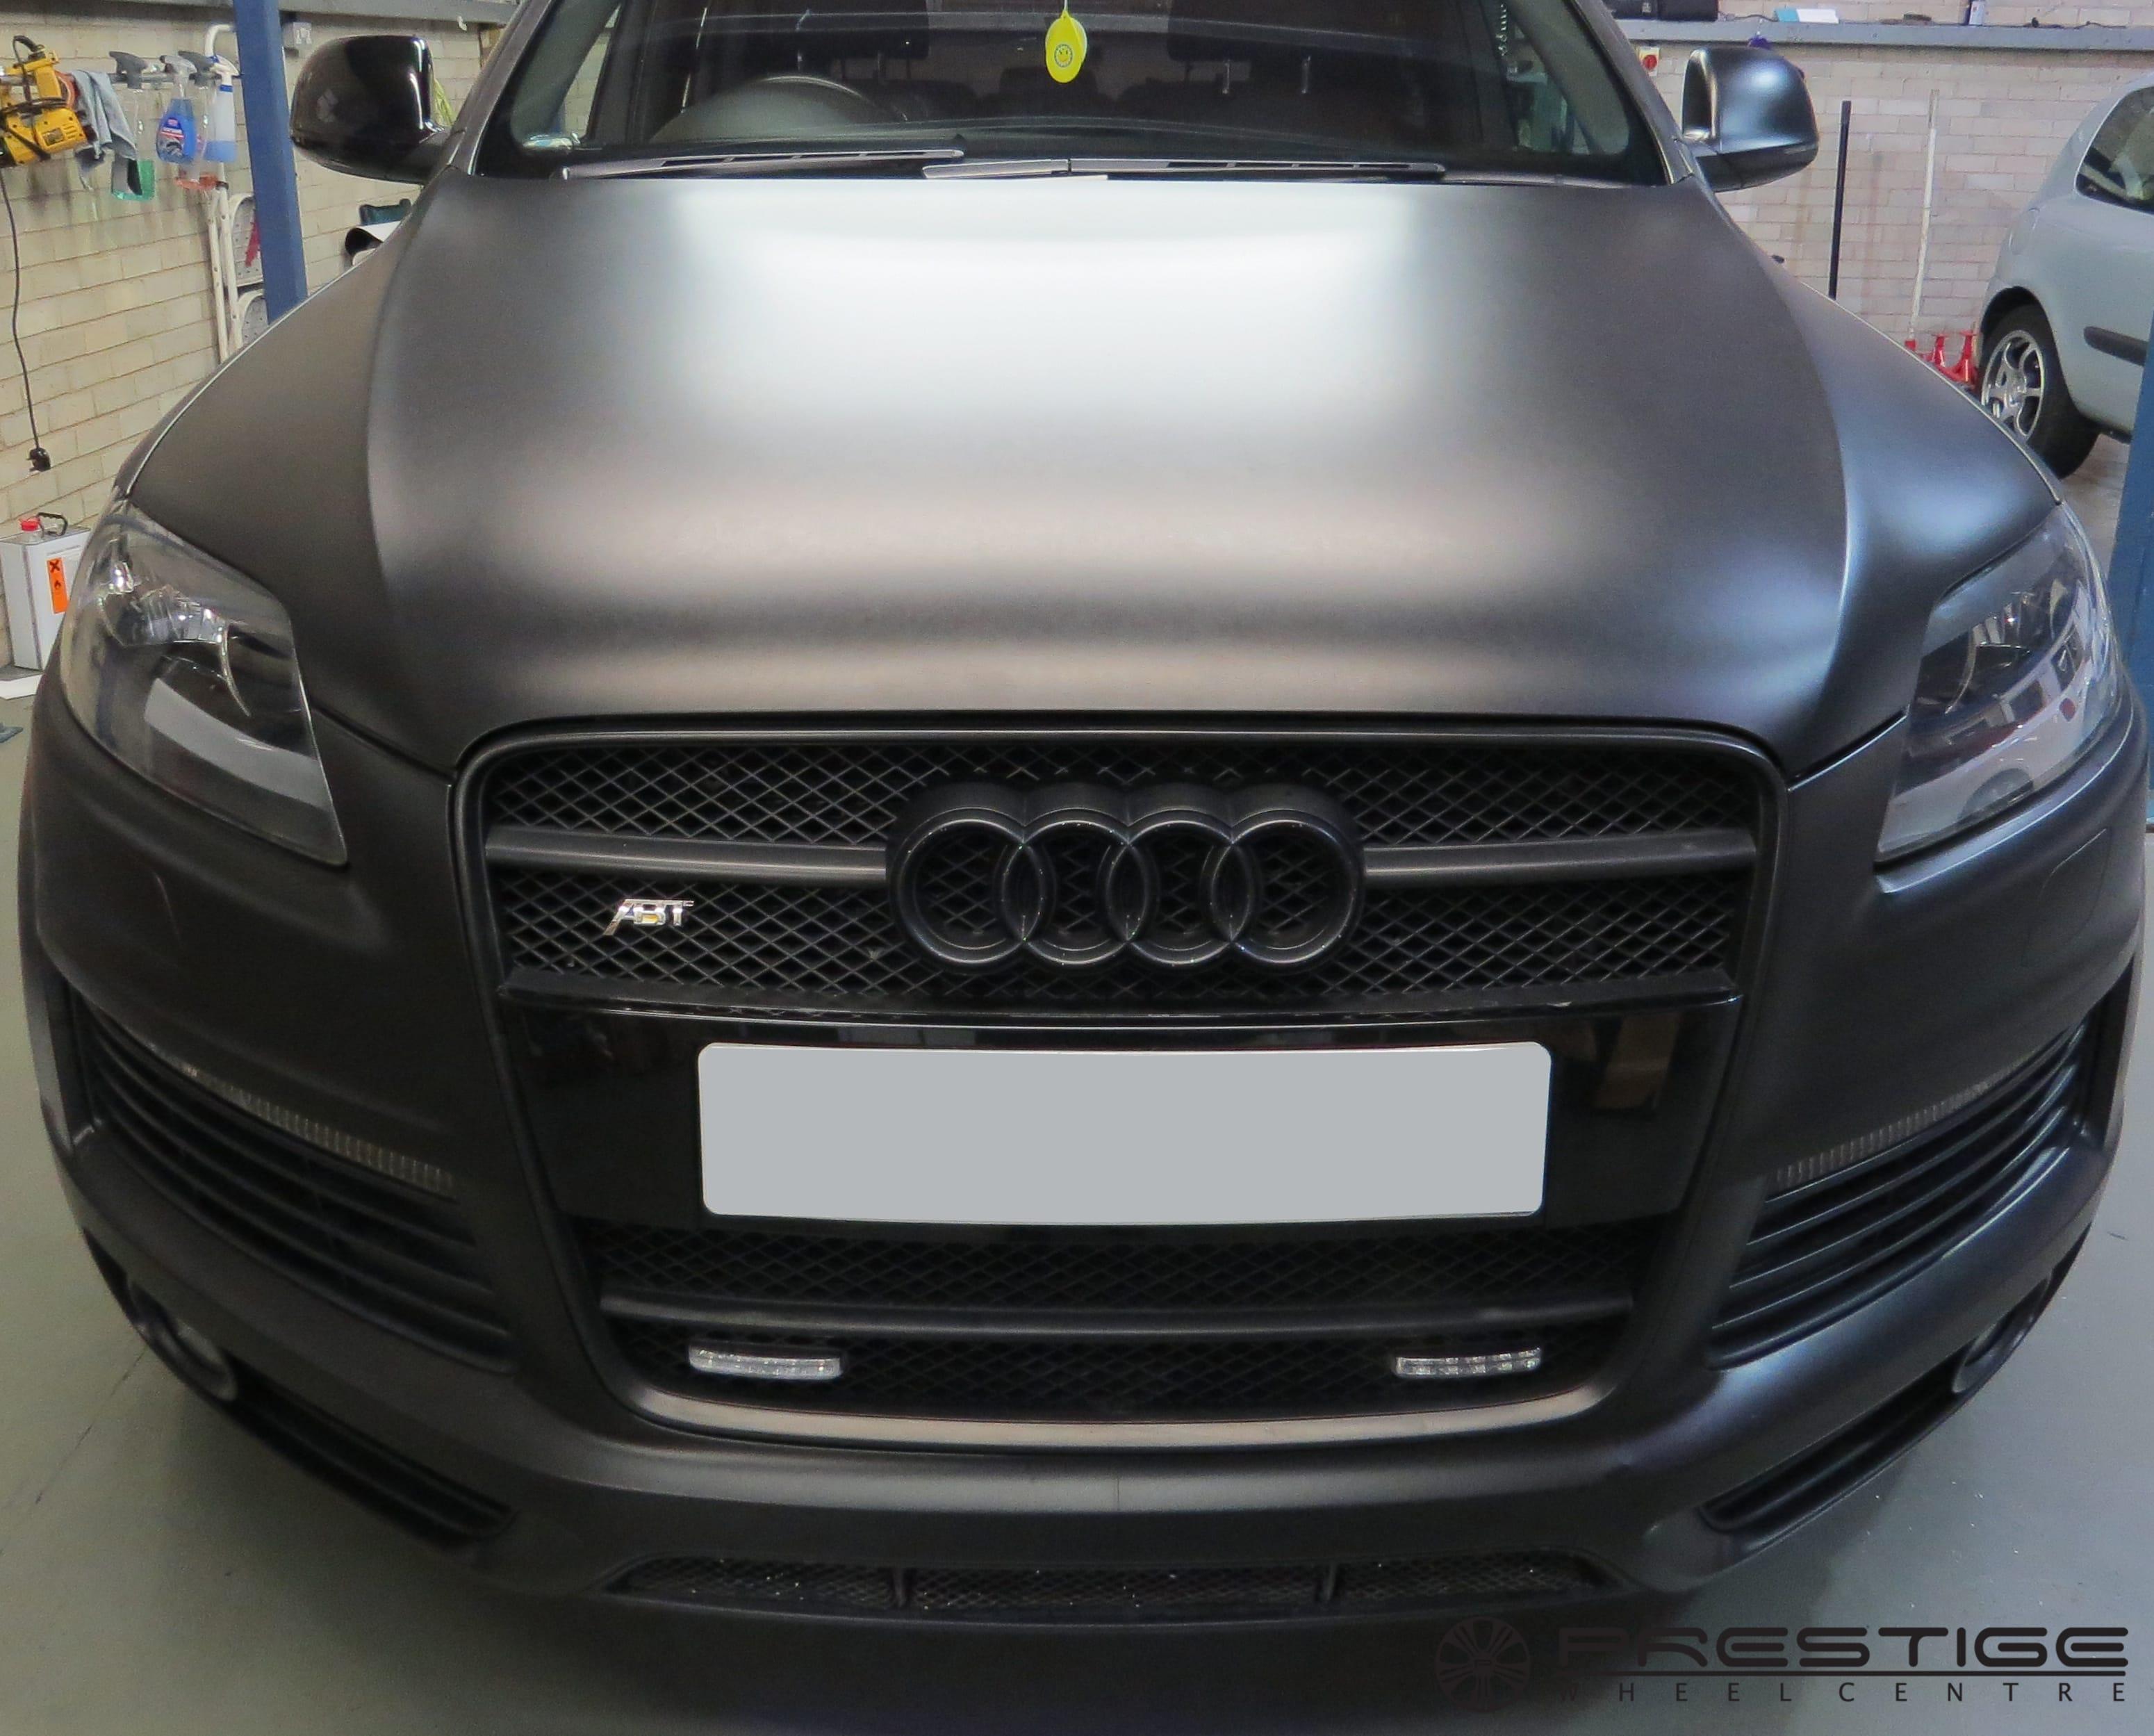 Audi Q7 Satin Black Vinyl Wrap And New 22 Hawke Wheels Prestige Wheel Centre News